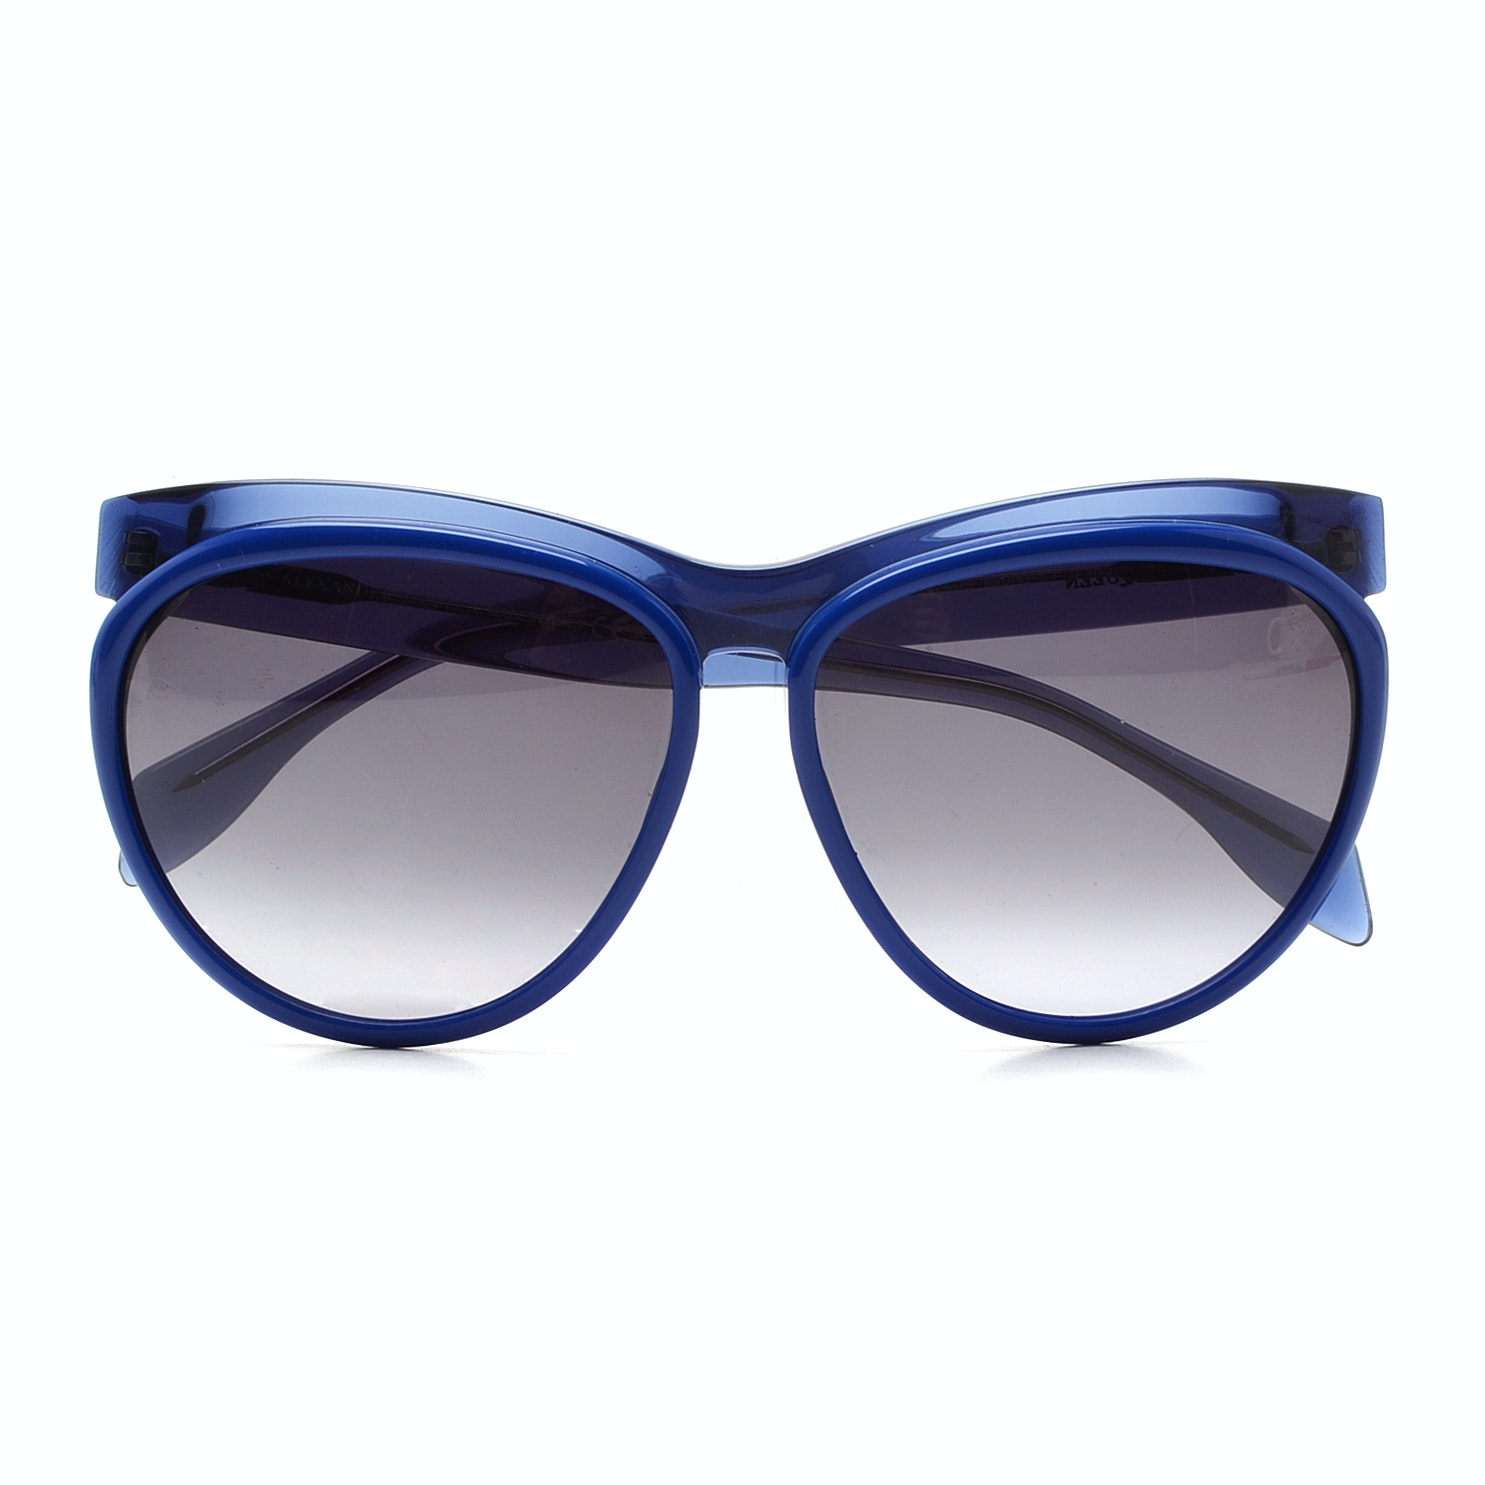 Alexander McQueen Blue 4248/S Sunglasses